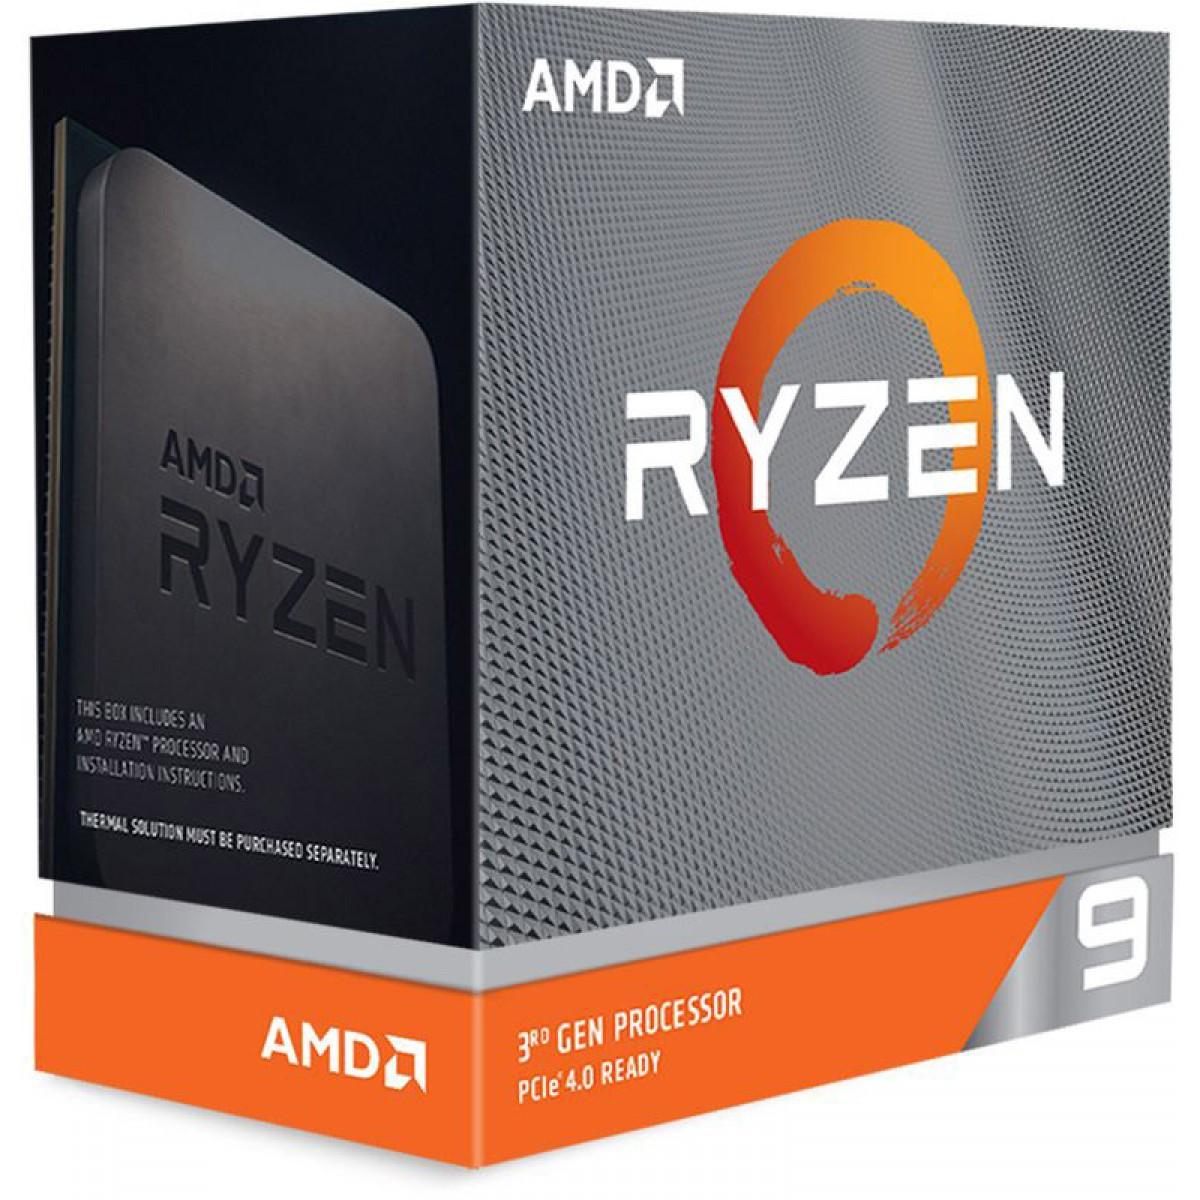 Processador AMD Ryzen 9 3950x 3.5Ghz (4.7ghz Turbo), 16-cores 32-threads, S-Cooler, AM4, S/ Video